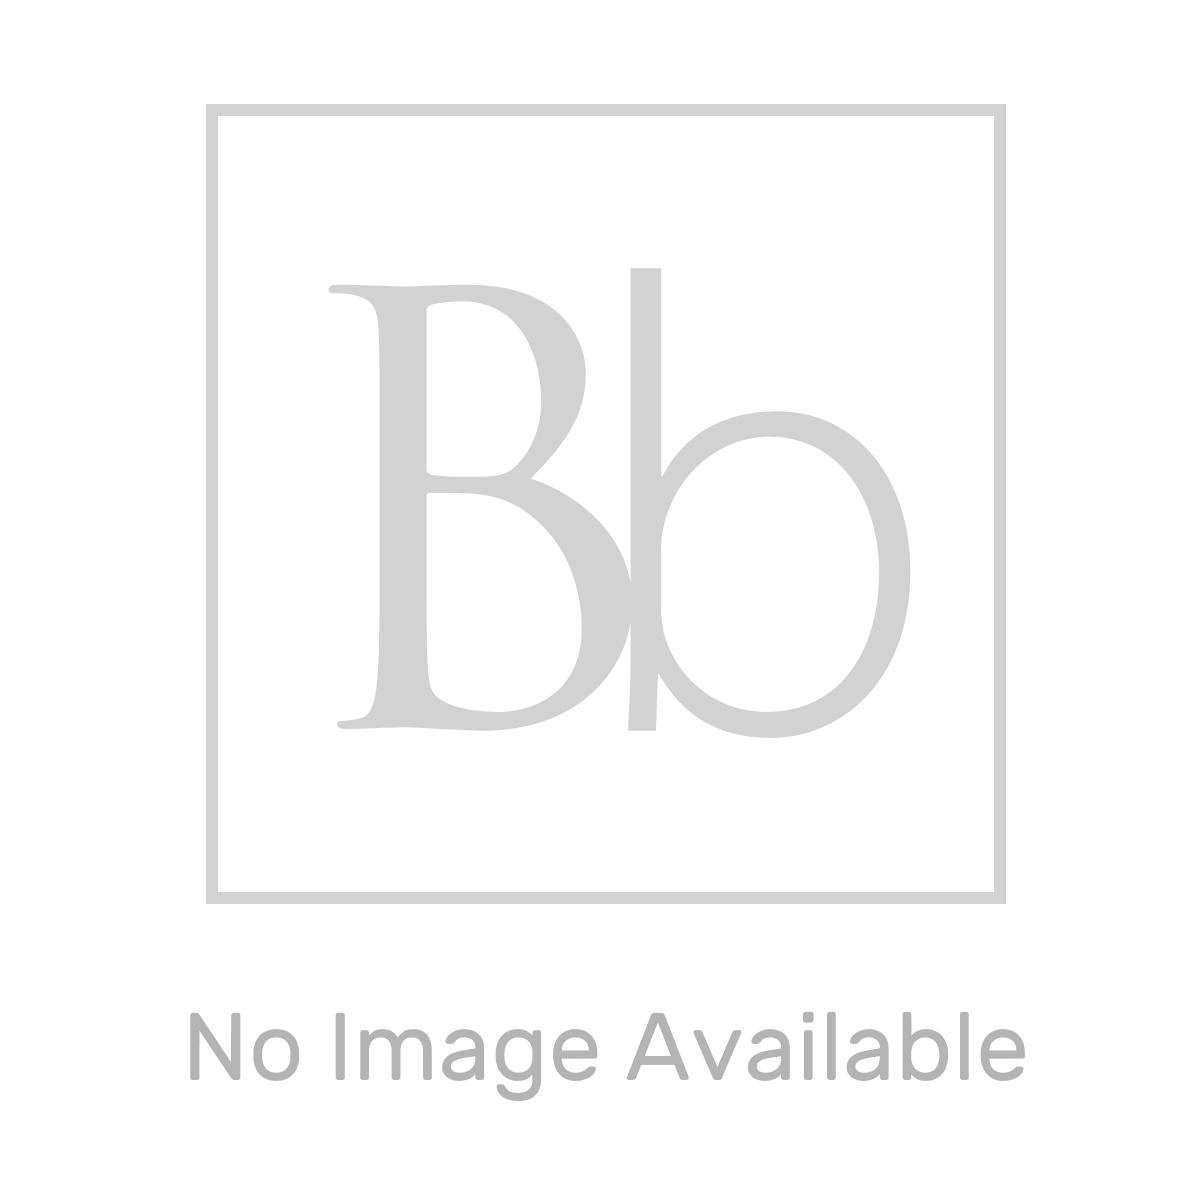 RAK Square Dual Outlet 2 Handle Thermostatic Shower Valve